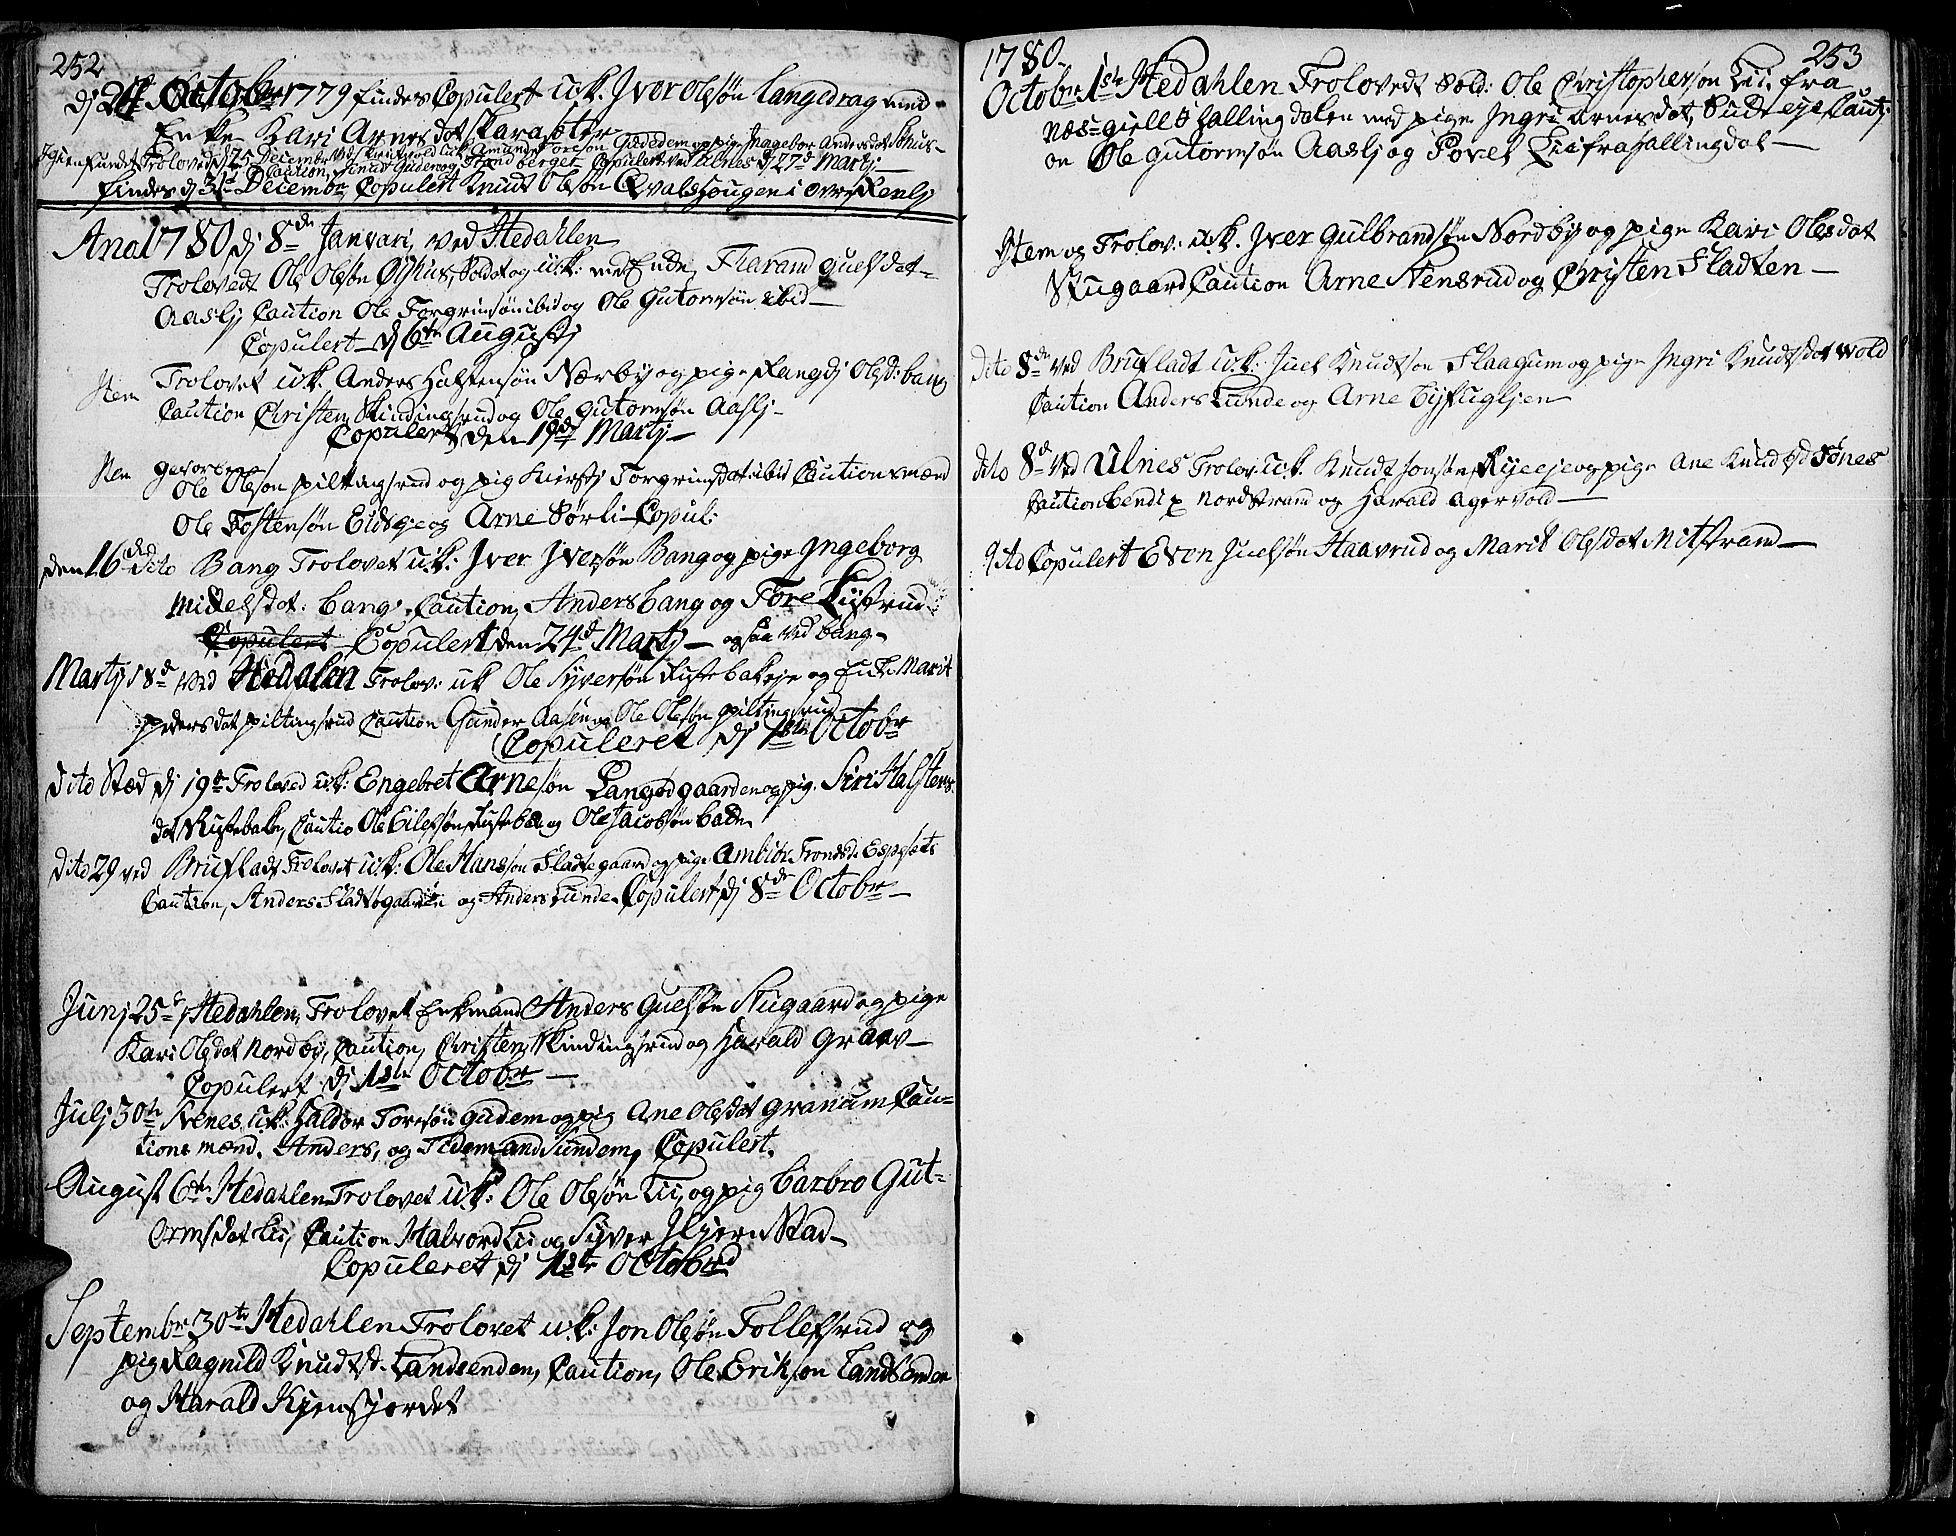 SAH, Aurdal prestekontor, Ministerialbok nr. 5, 1763-1781, s. 252-253